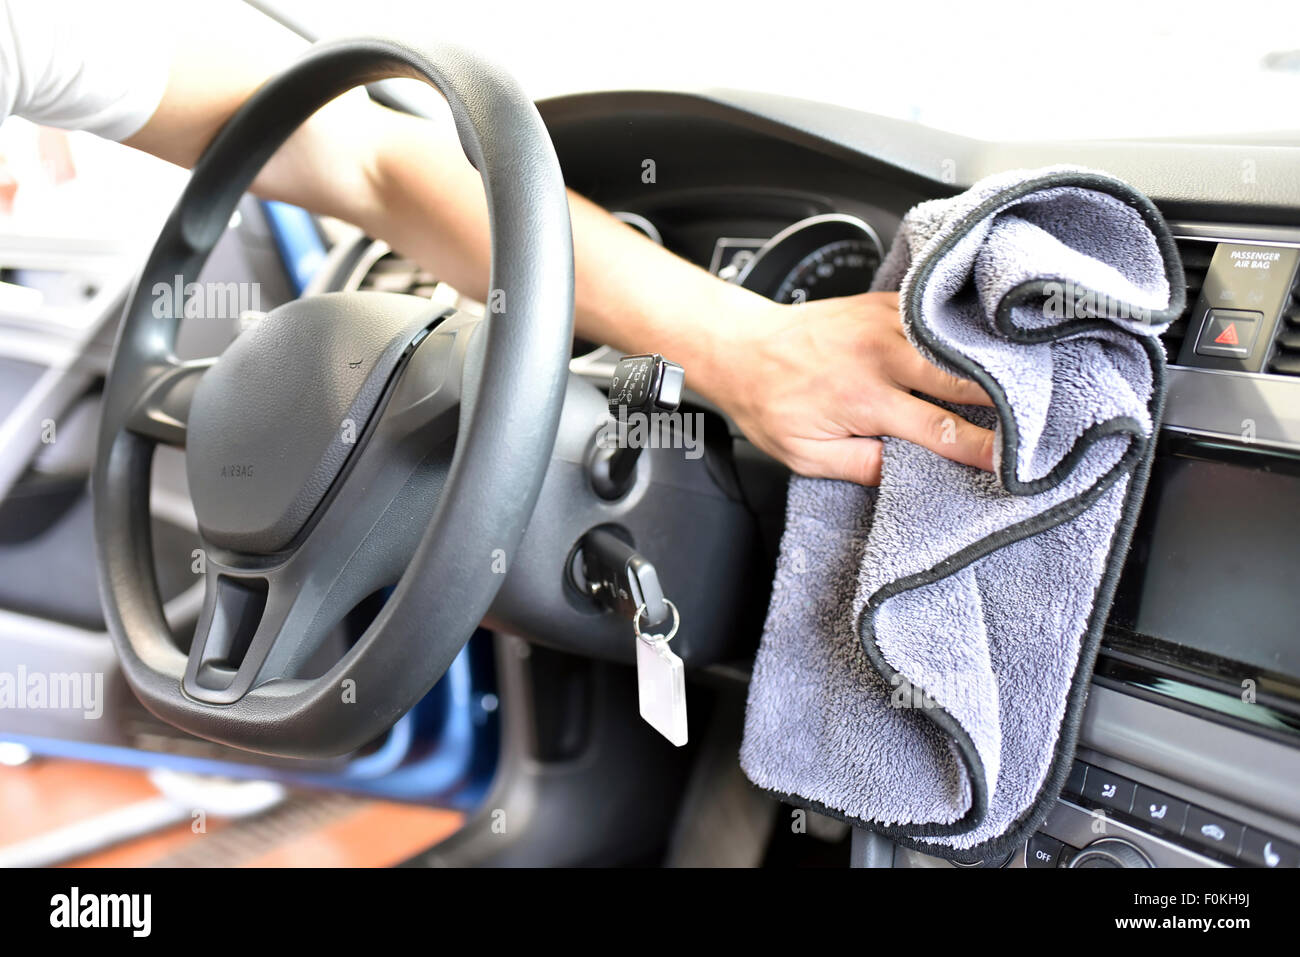 Man Cleaning Car Interior